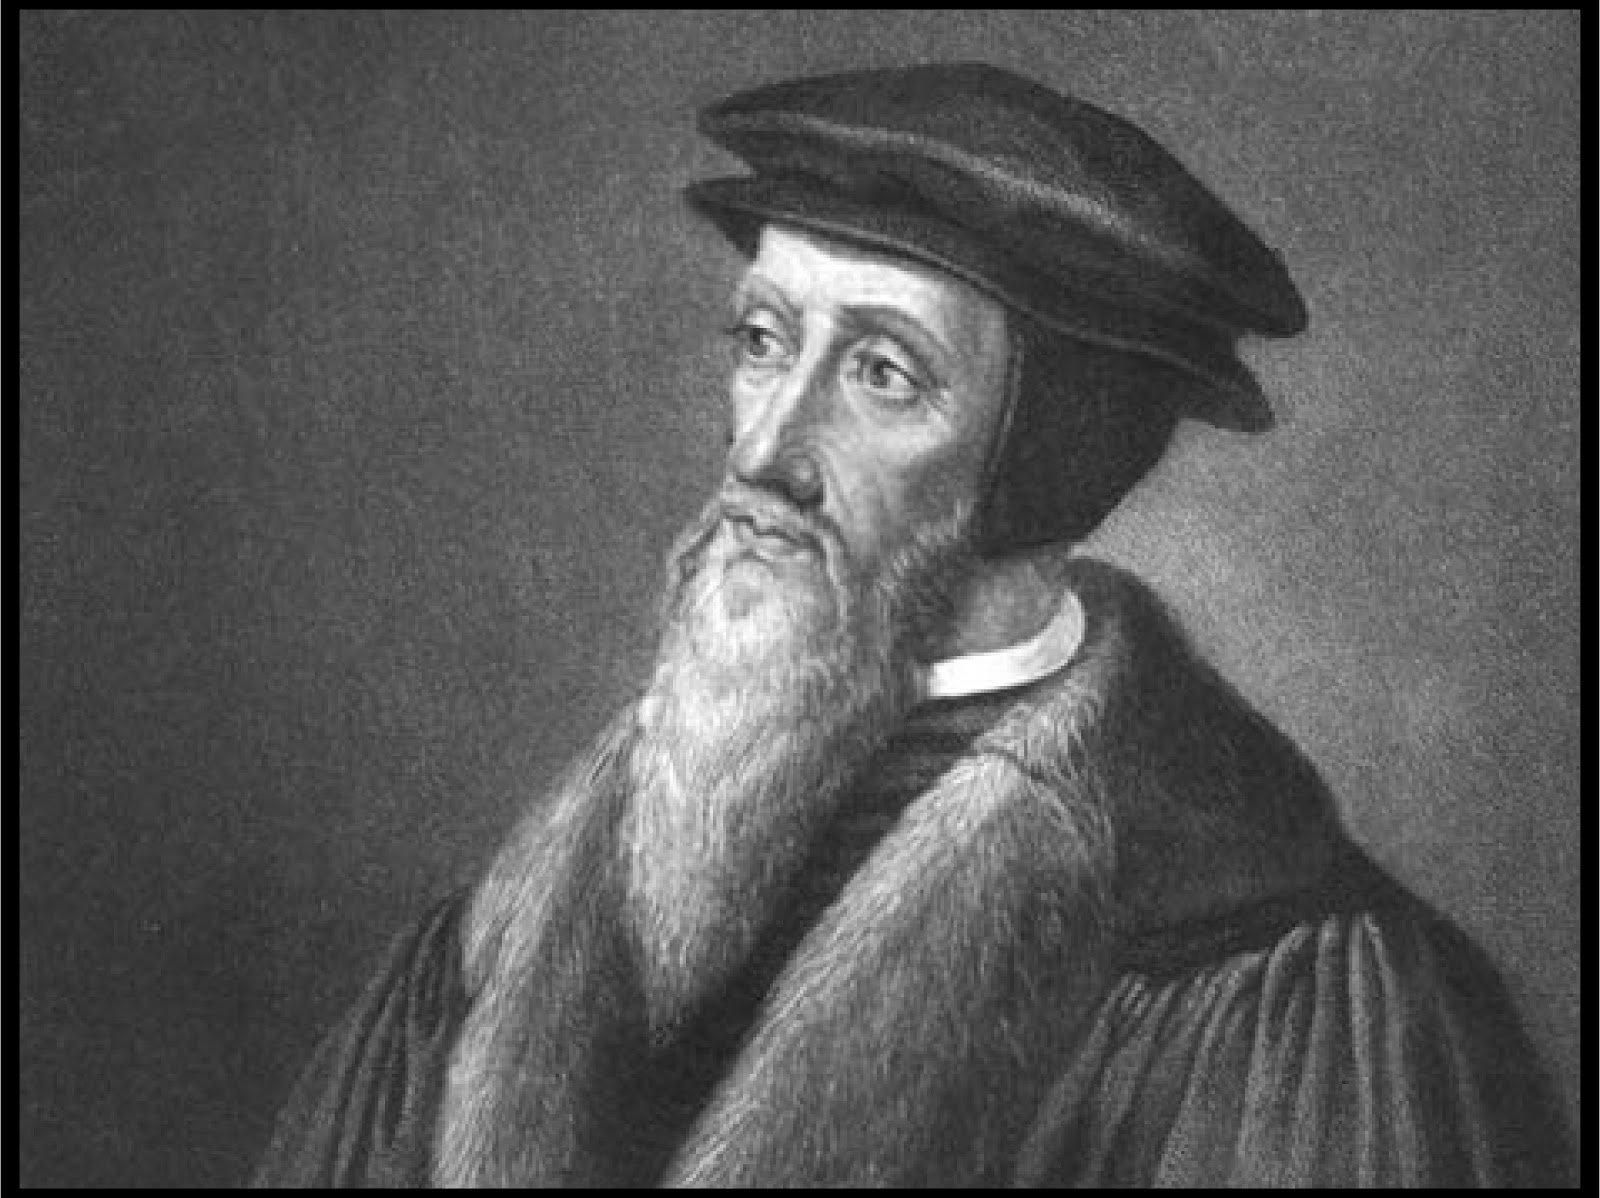 https://i0.wp.com/gospelrelevance.com/wp-content/uploads/2016/11/5-encouraging-john-Calvin-Quotes.jpg